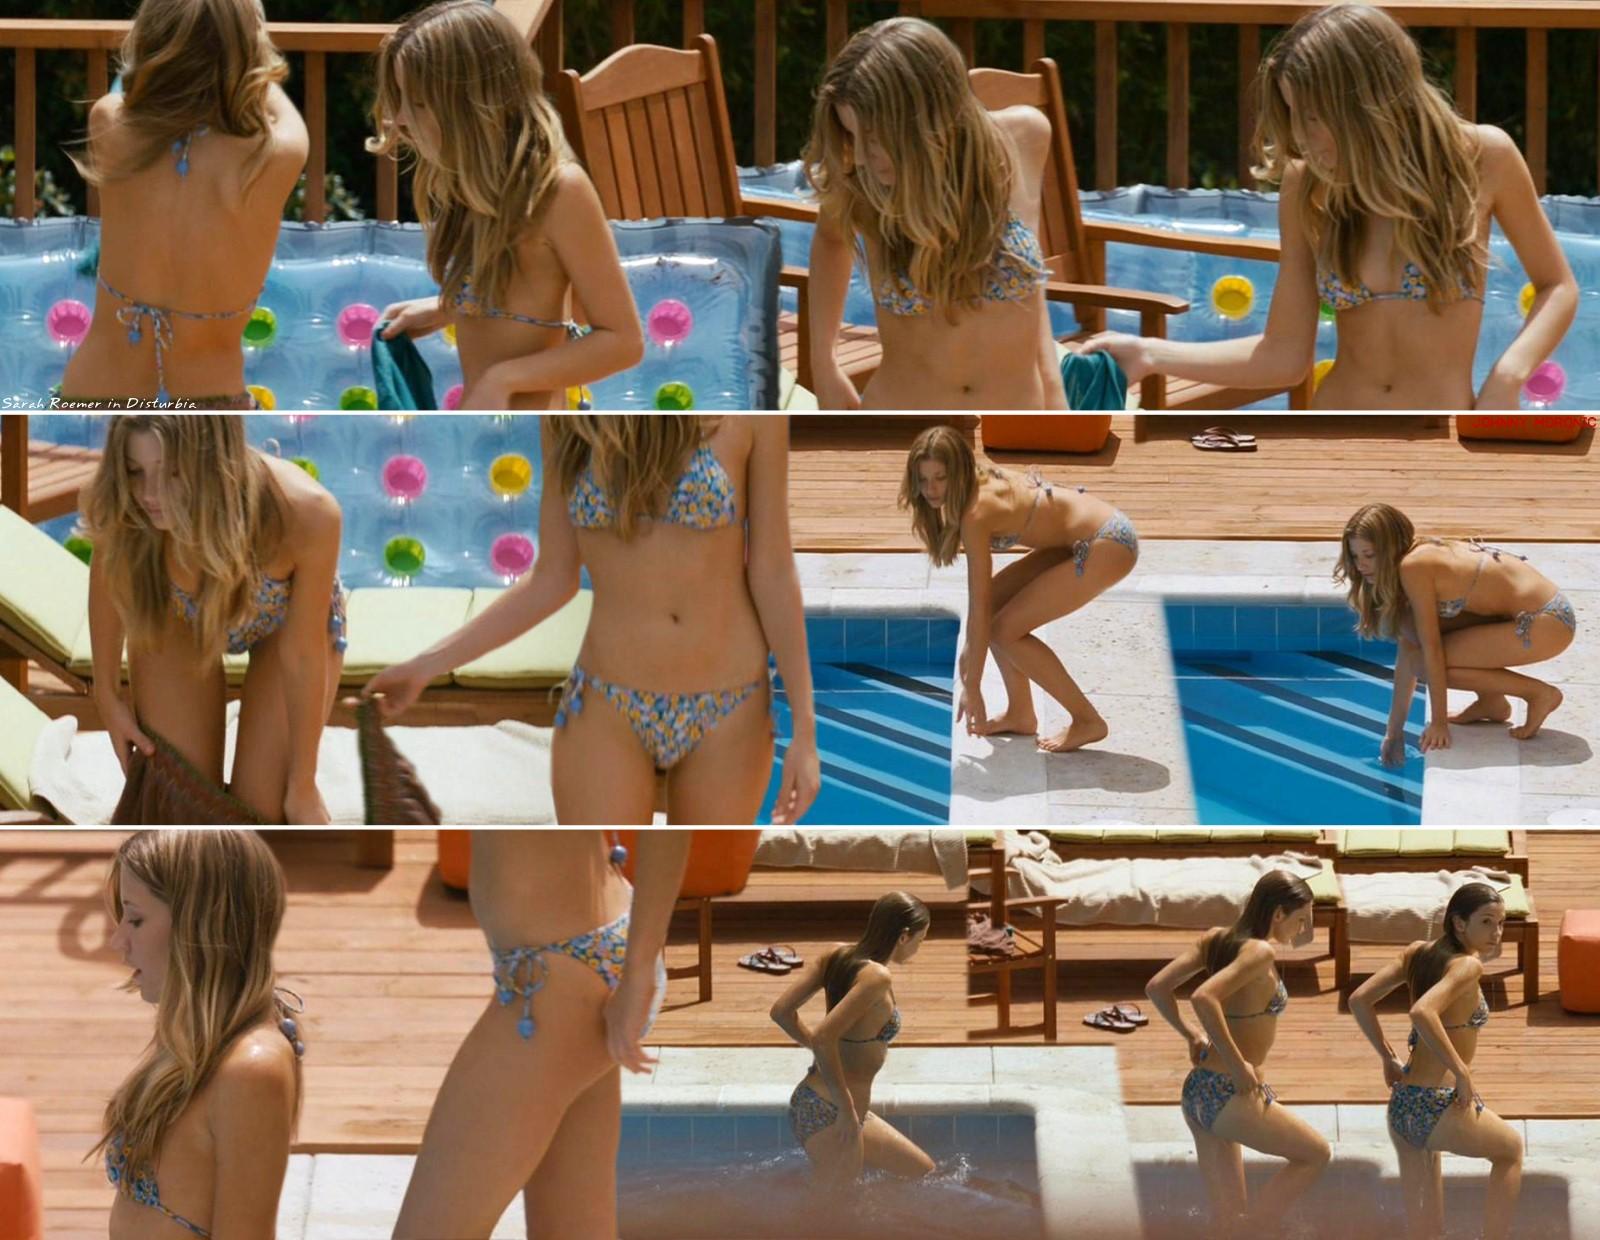 Lysa thatcher nude photos